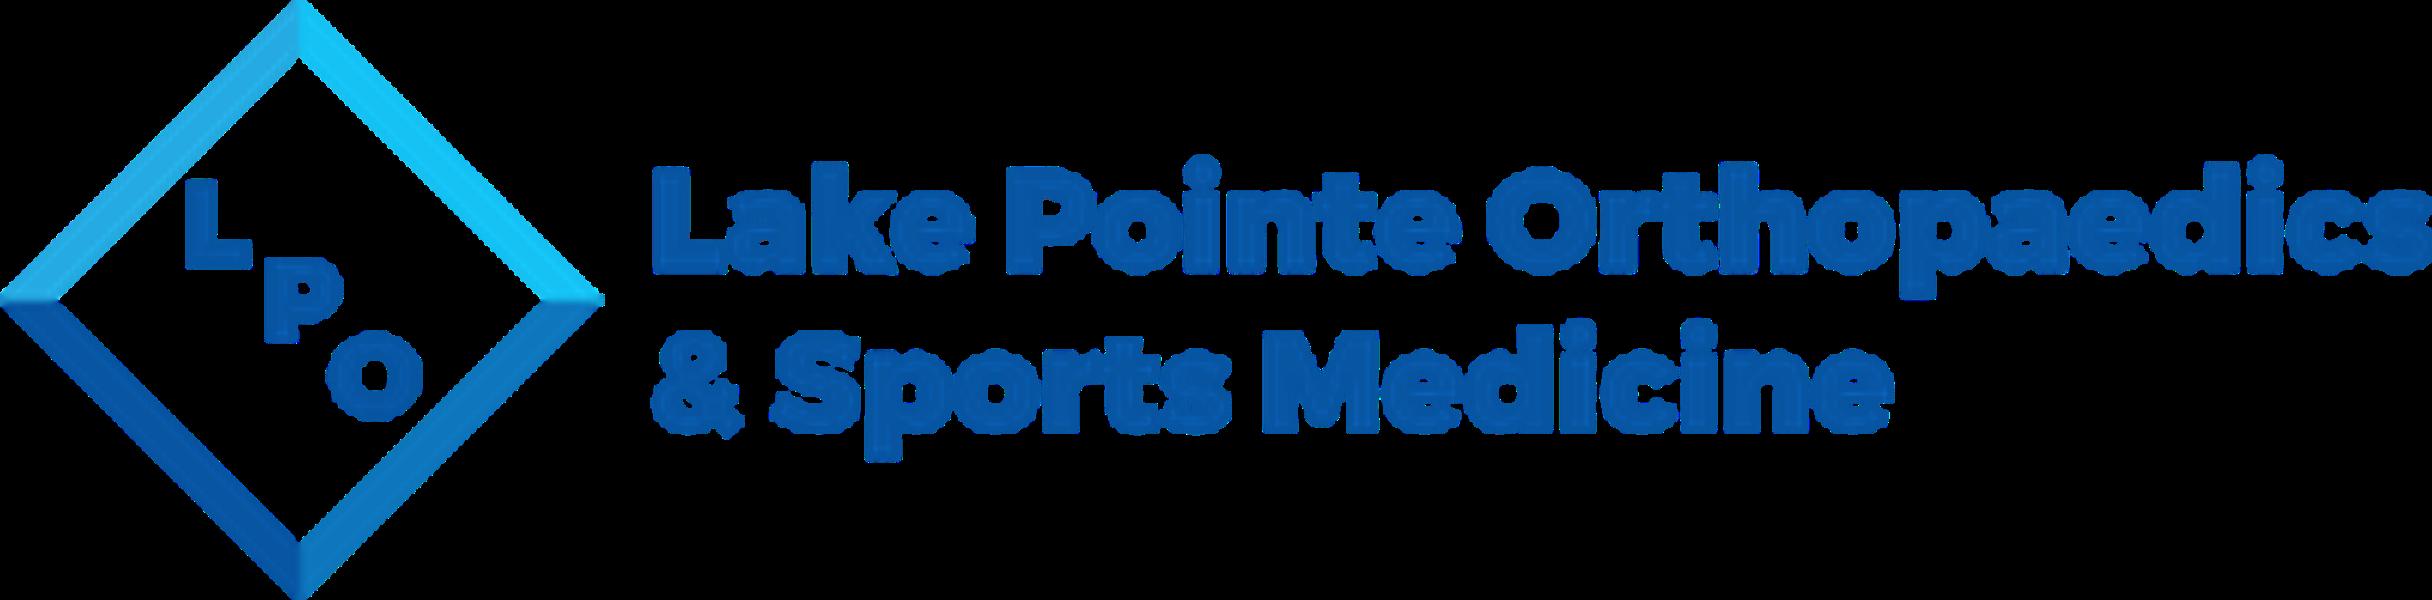 Lake Pointe Orthopaedics & Sports Medicine